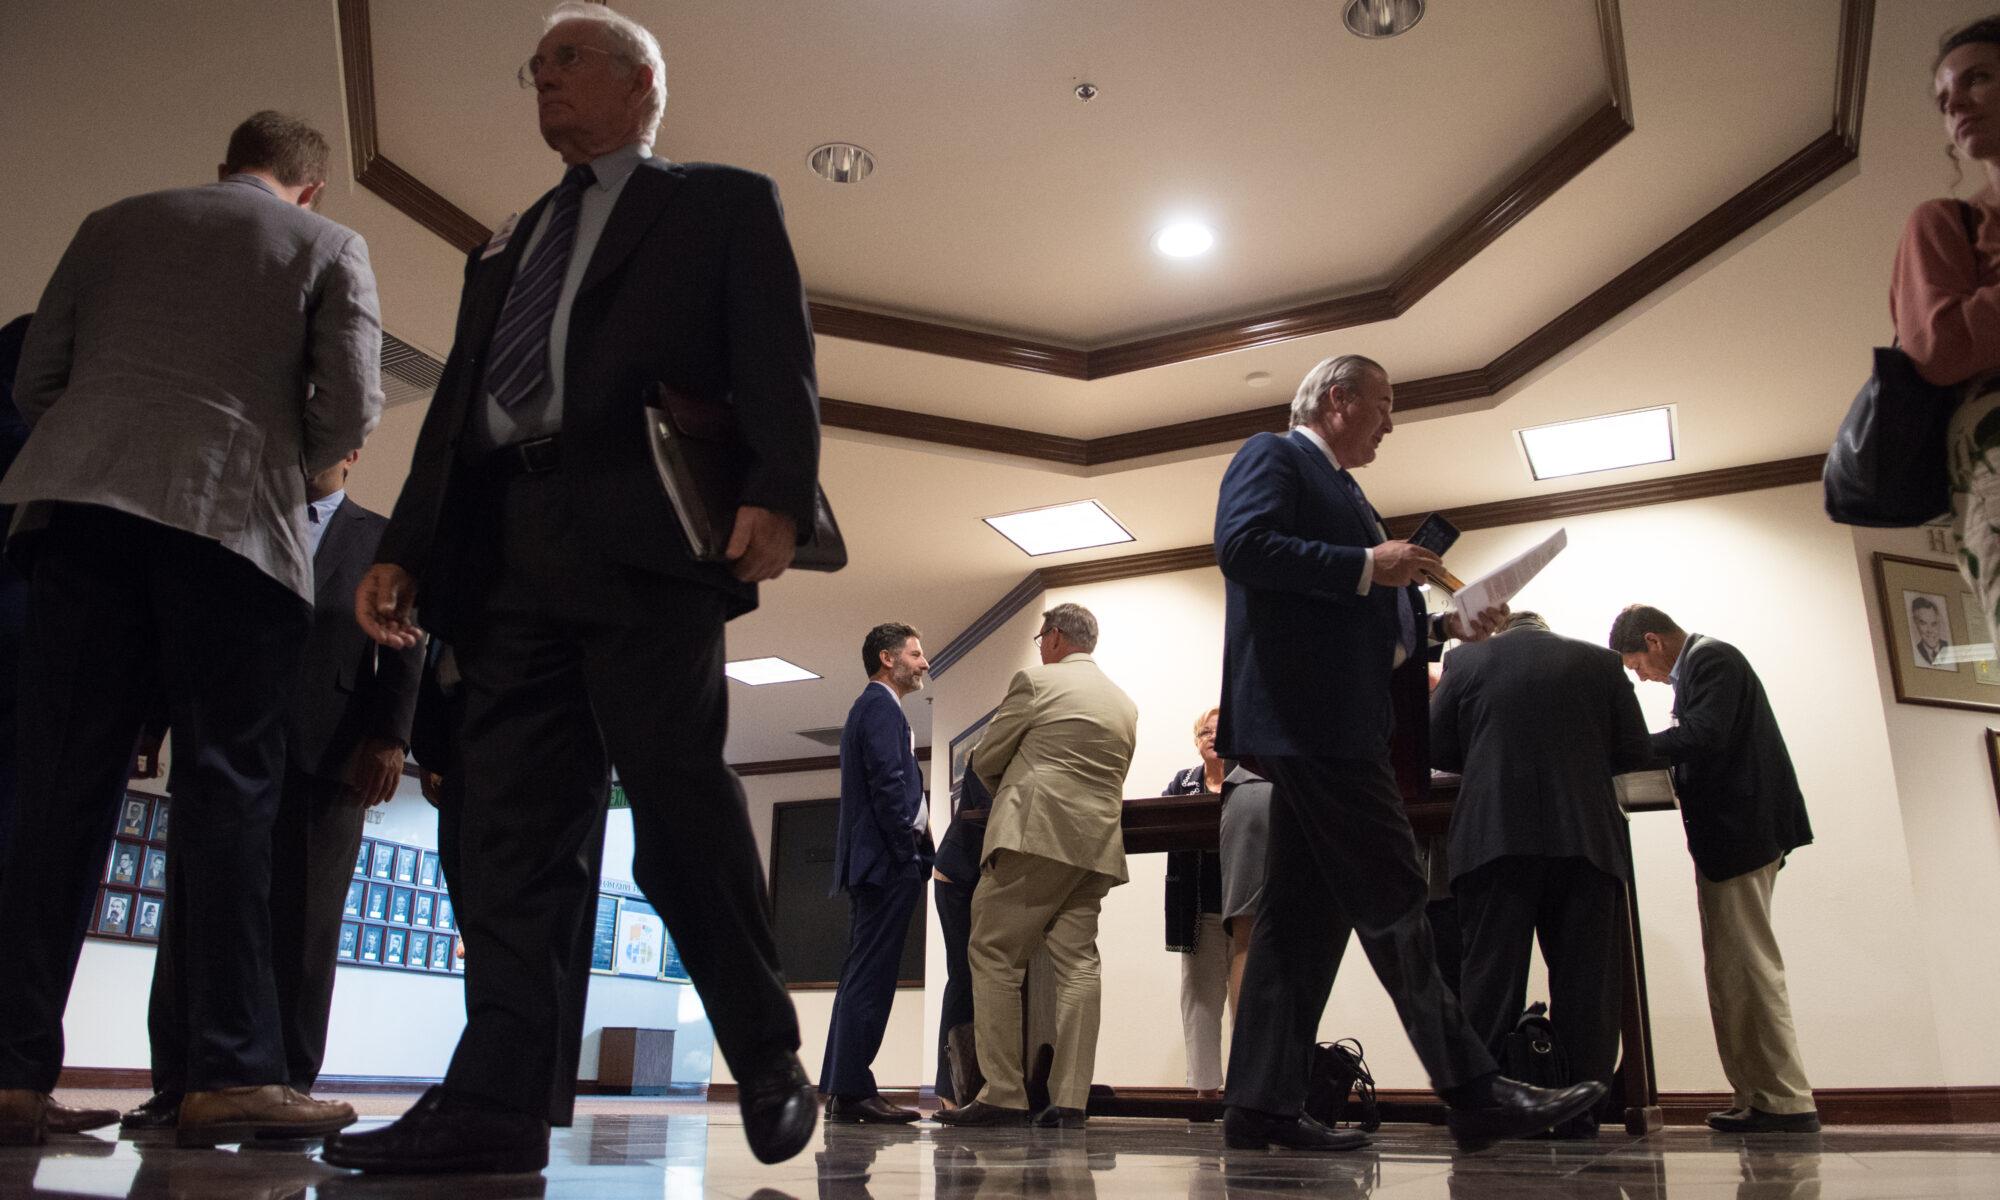 Counties, cities spent millions lobbying the Legislature